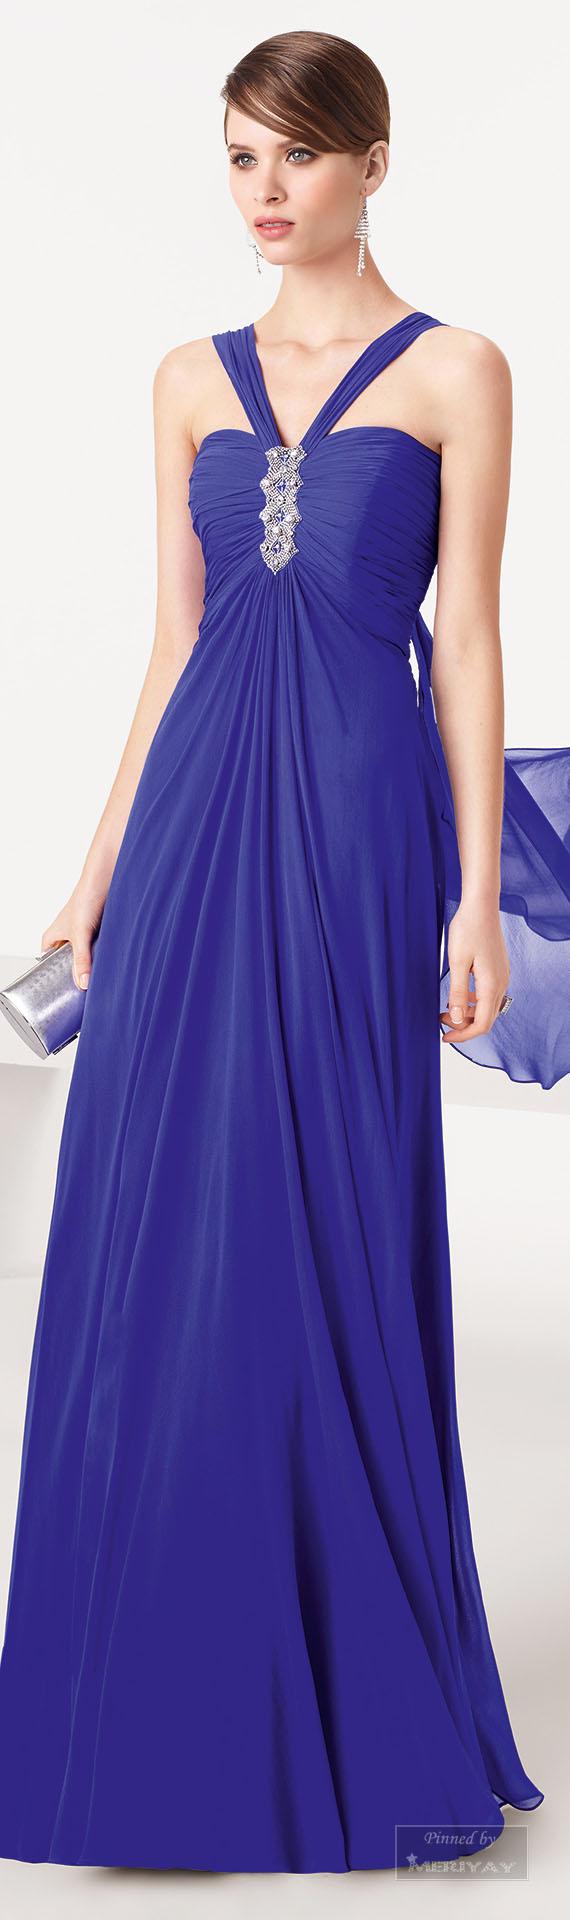 Aire Barcelona.2015. | moda largo azul | Pinterest | Azul ...